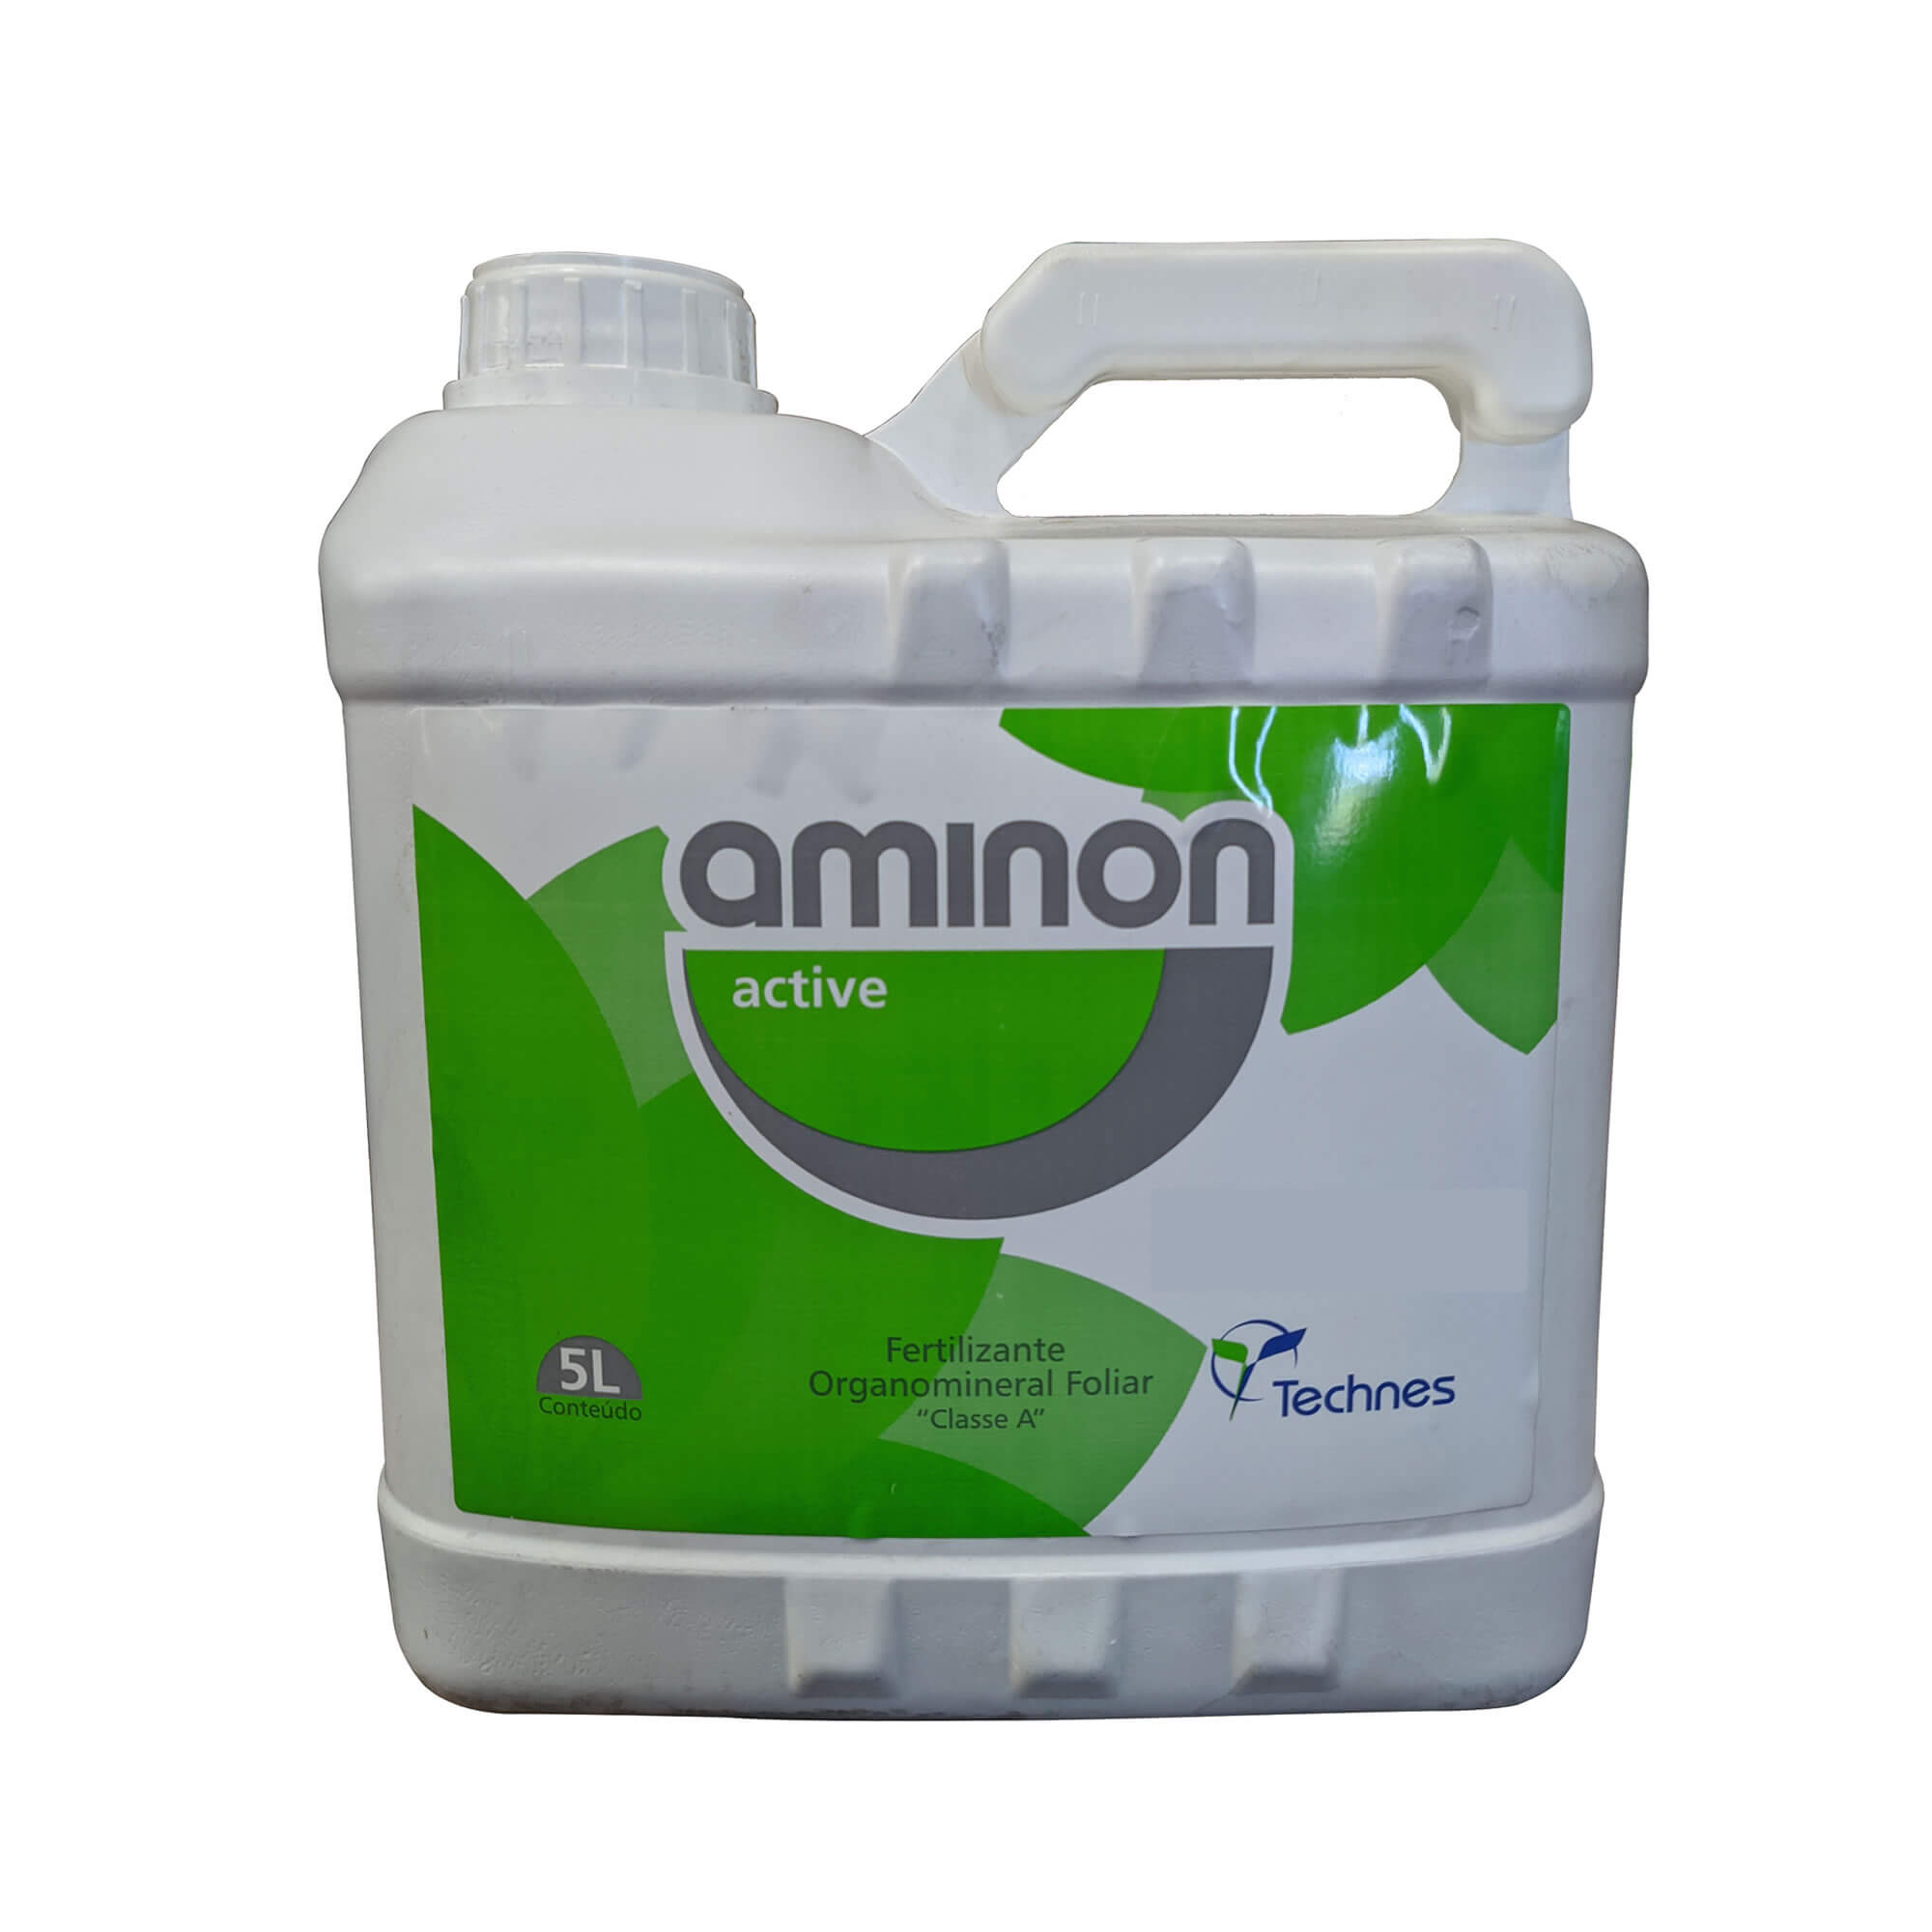 Aminon Active - Fertilizante Organomineral Foliar - 5 litros